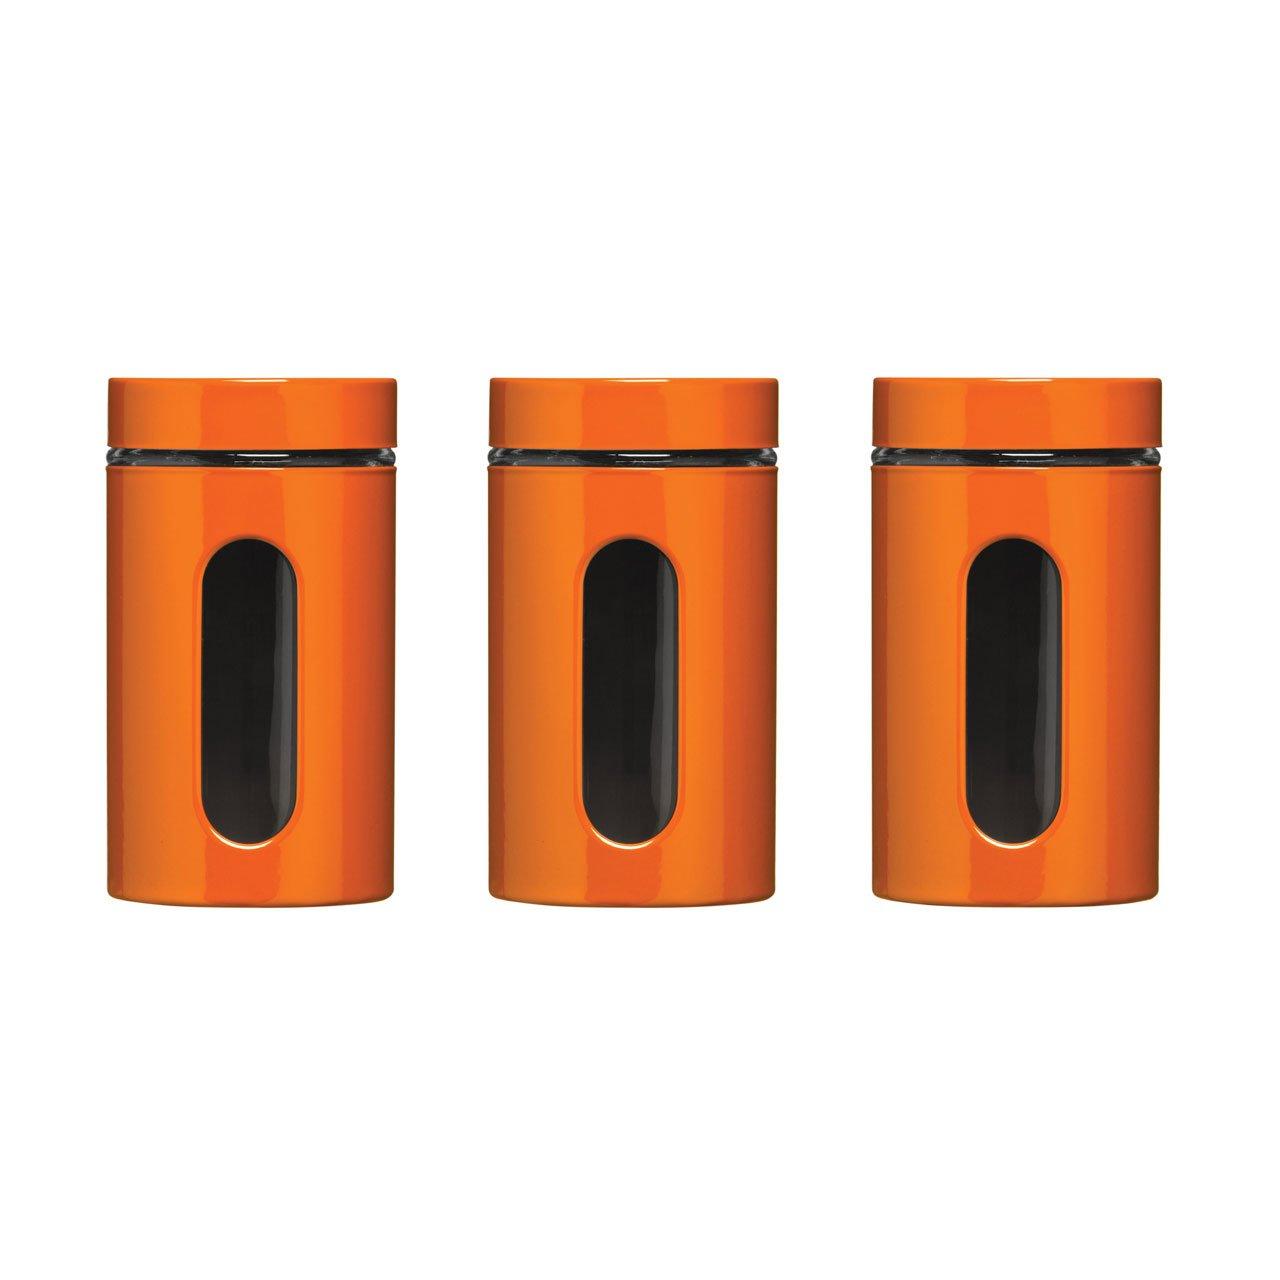 Orange Enamel Finish Tea Coffee Sugar Jar Canisters 1000ml Multi Purpose  Storage Jars Set With Glass Window: Amazon.co.uk: Kitchen U0026 Home